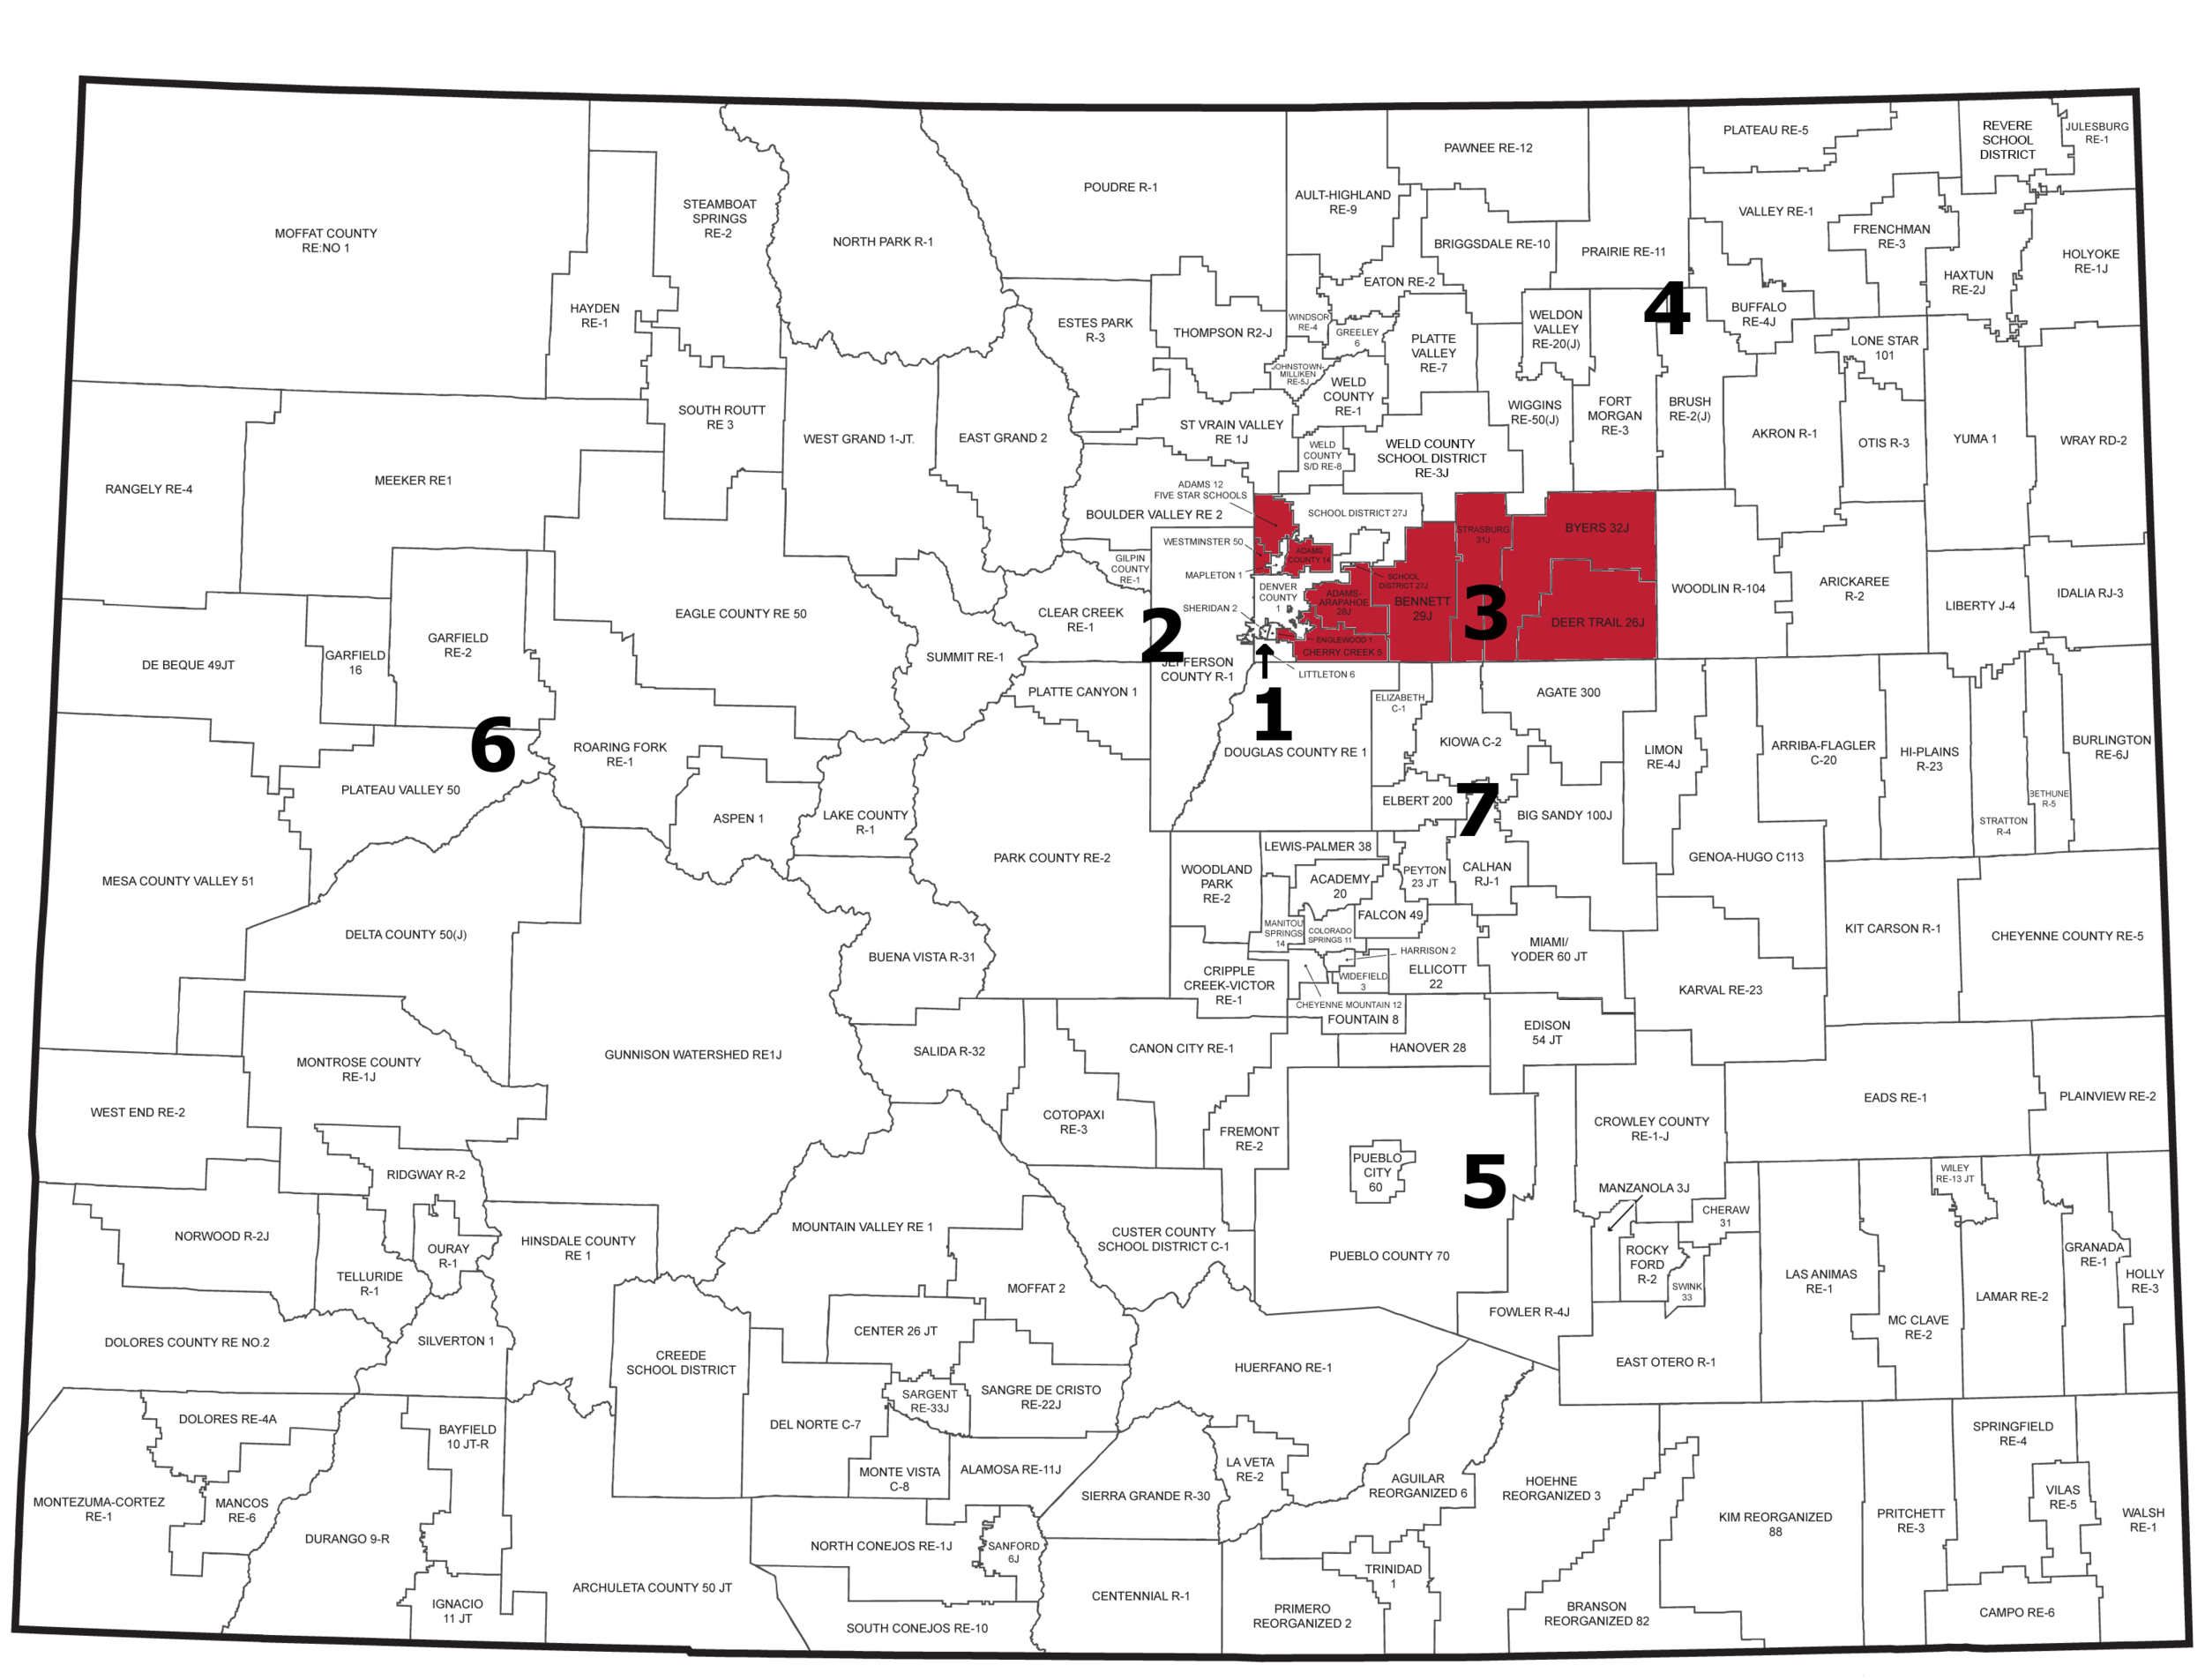 Region 3: Aurora Public Schos, Adams County 14, Bennett 29J, Northglenn, Thornton, Strasburg, Westminster, Byers, Cherry Creek, Deer Trail